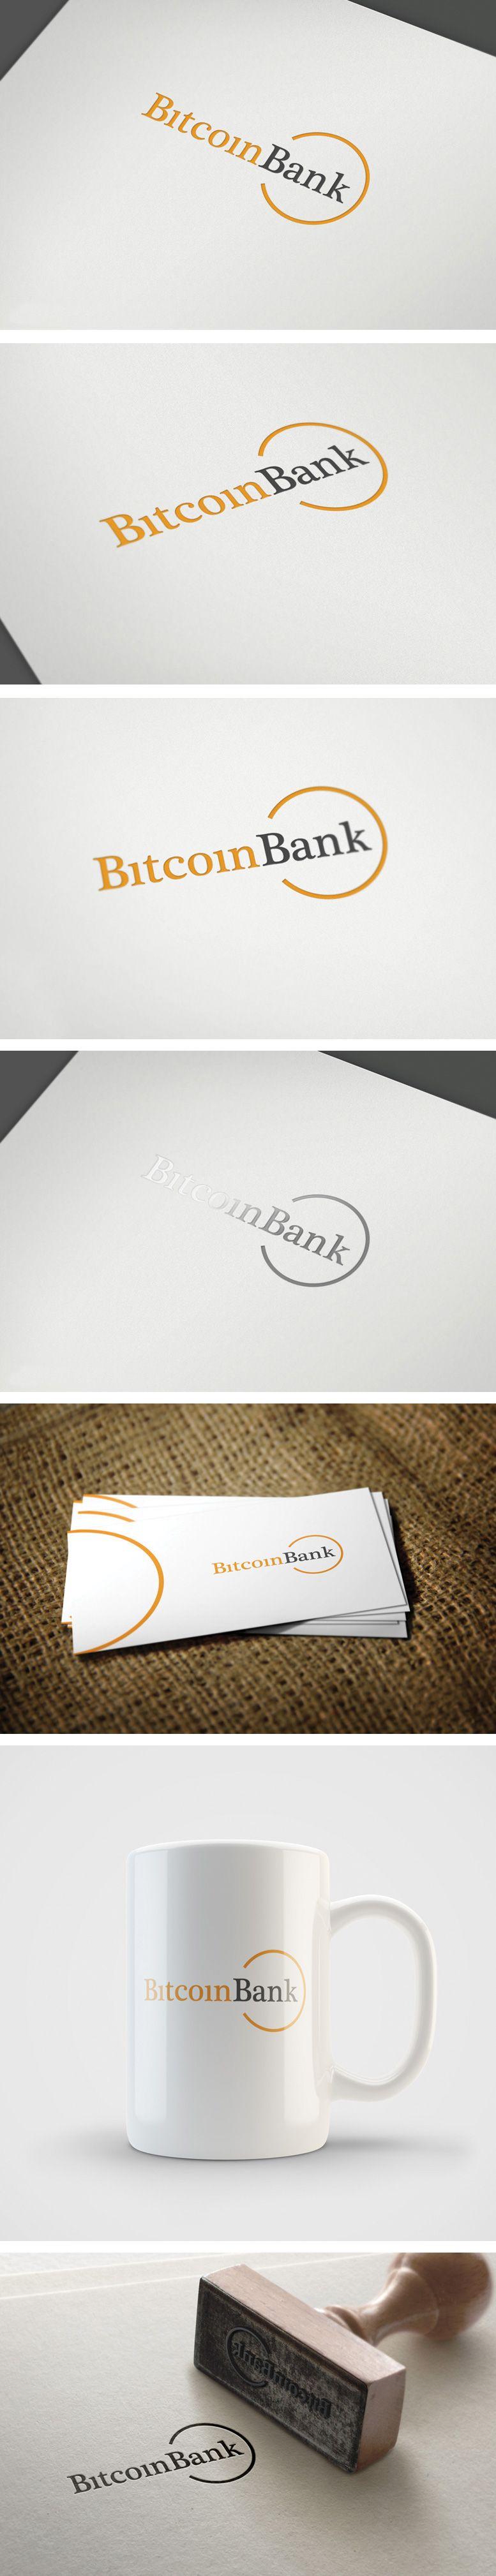 BitcoinBank - Логотип - дизайнер GreenRed